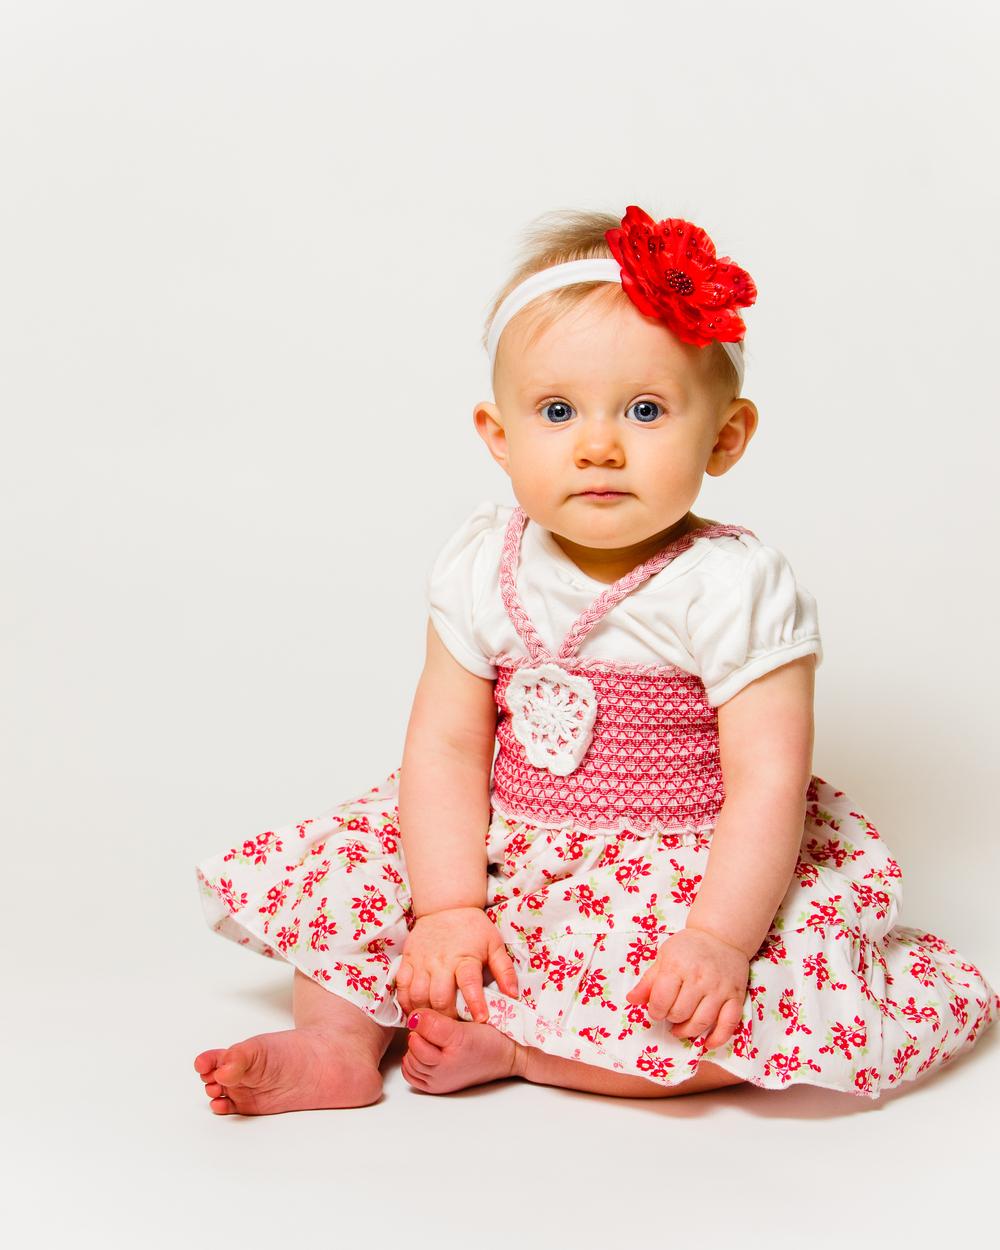 043-BabyZoey-1.jpg